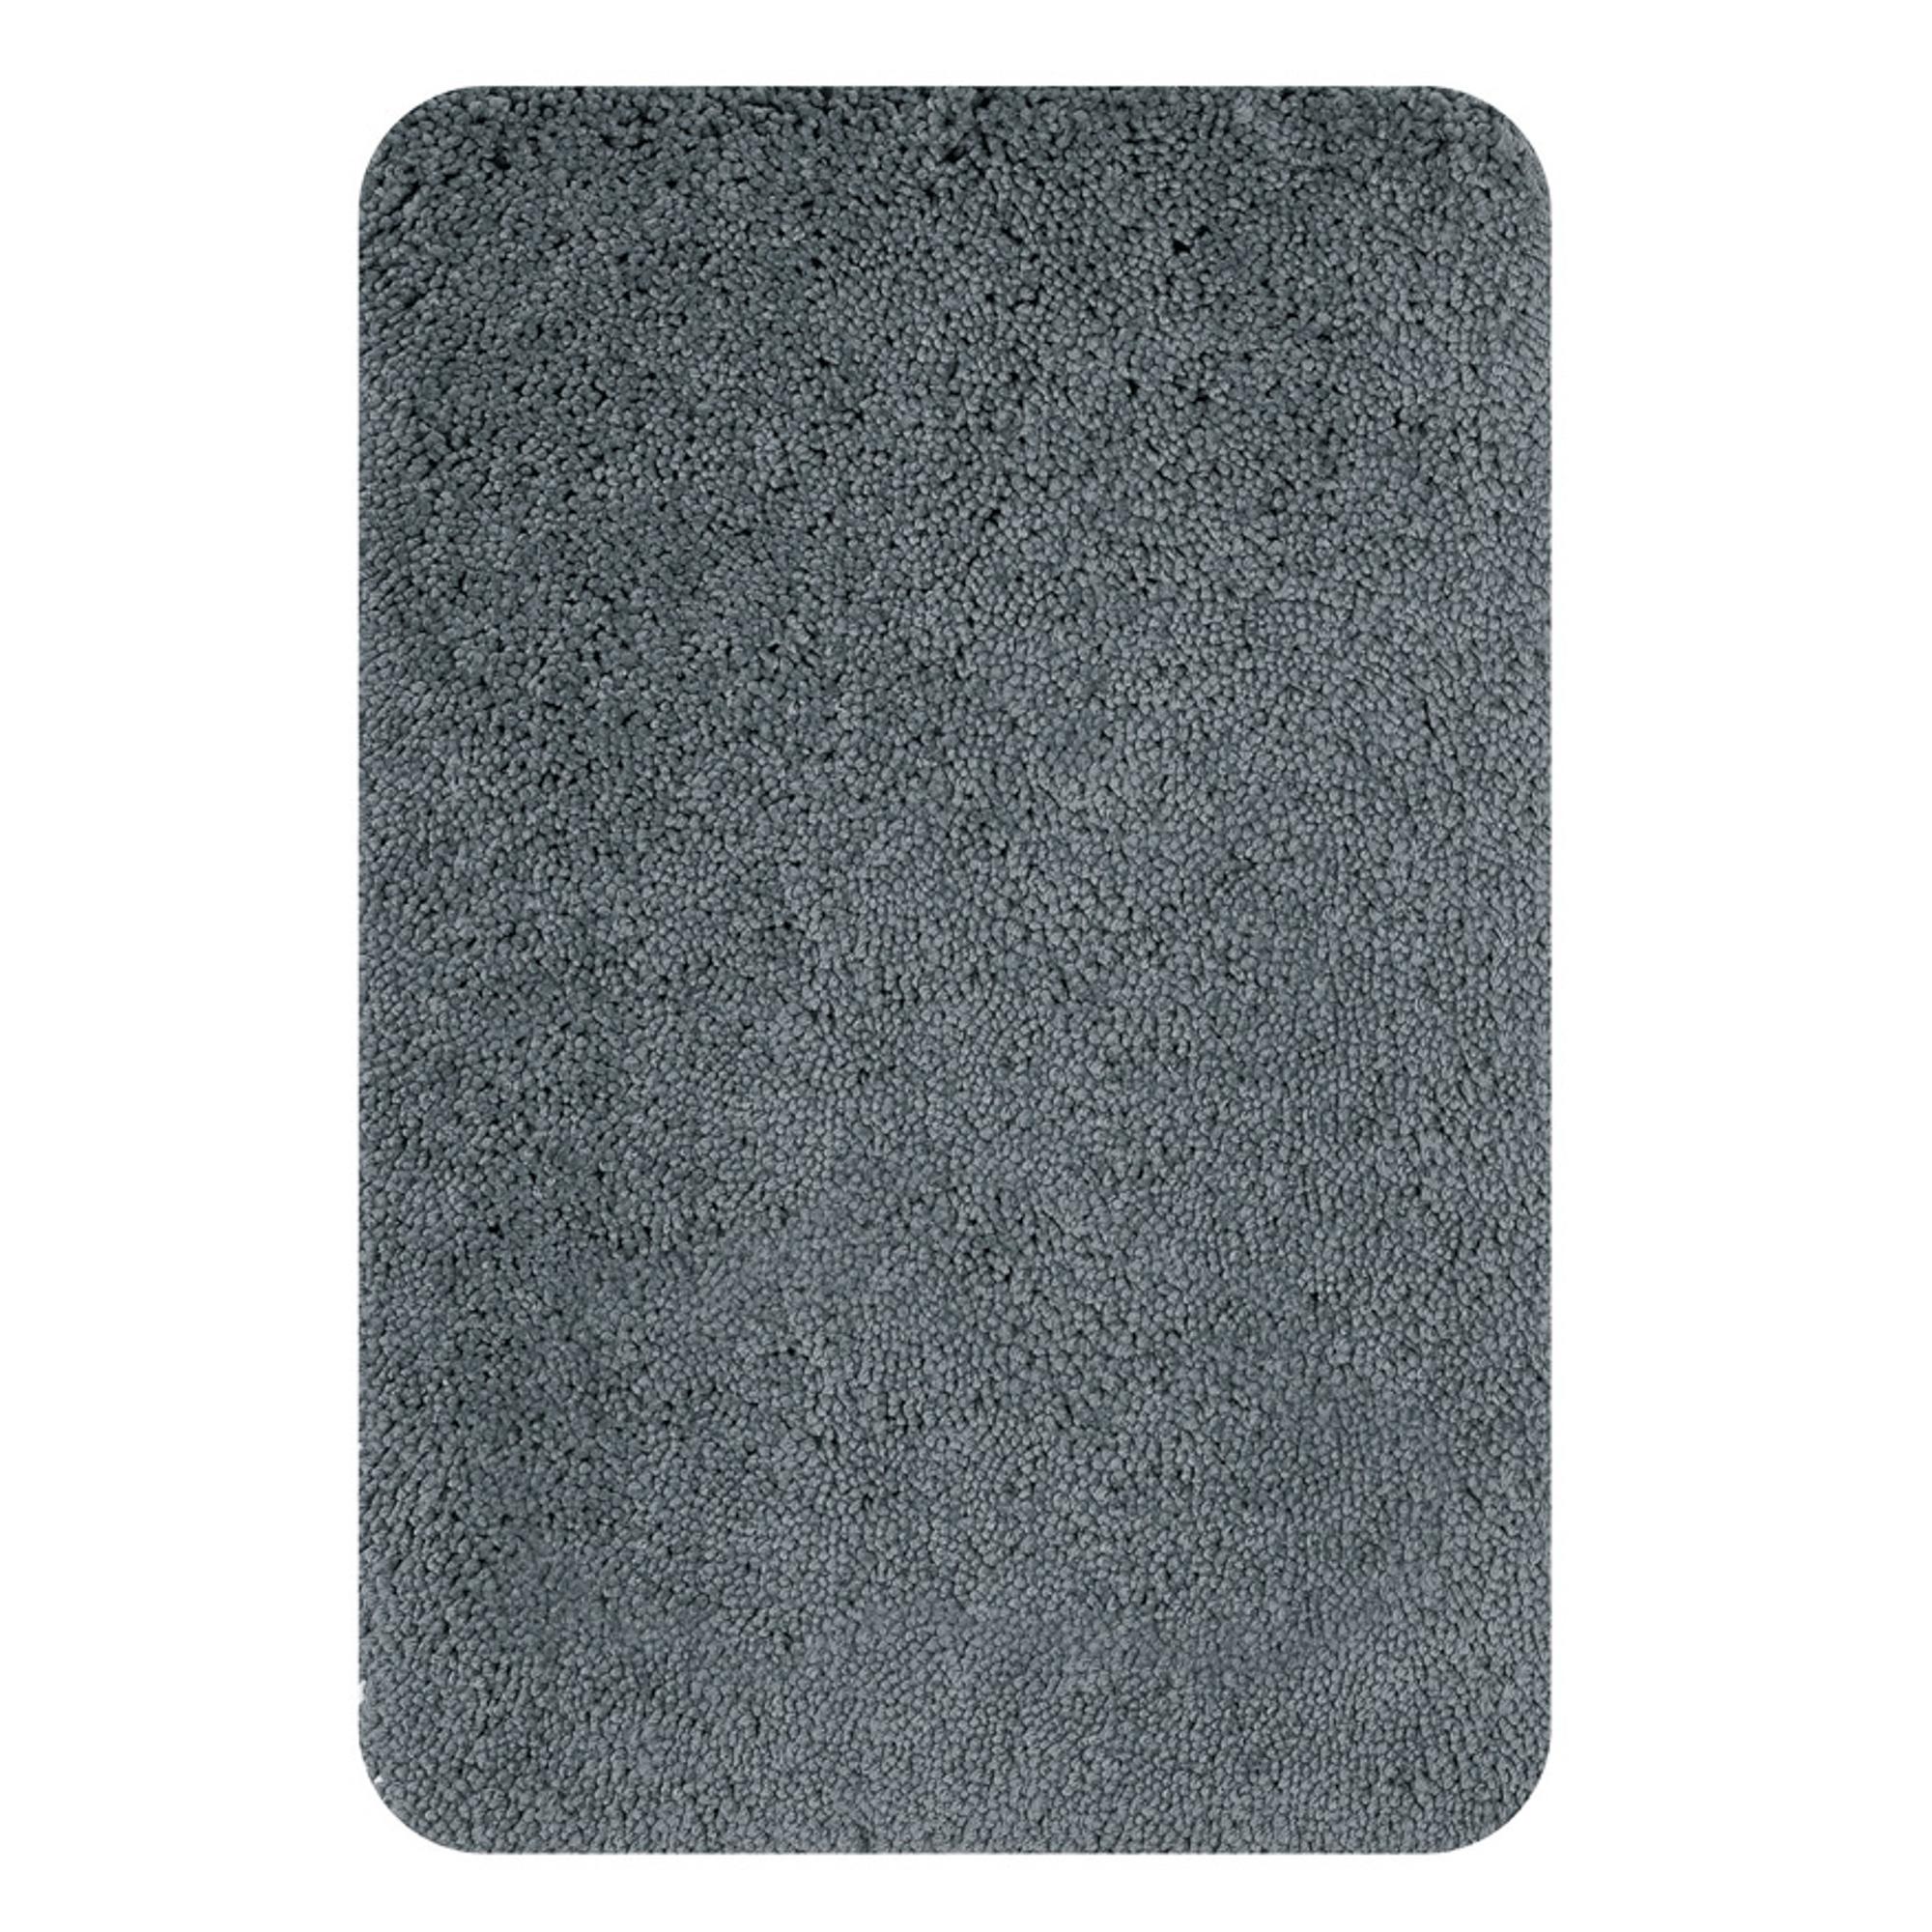 Коврик для ванны Spirella Highland серый 60х90 см фото